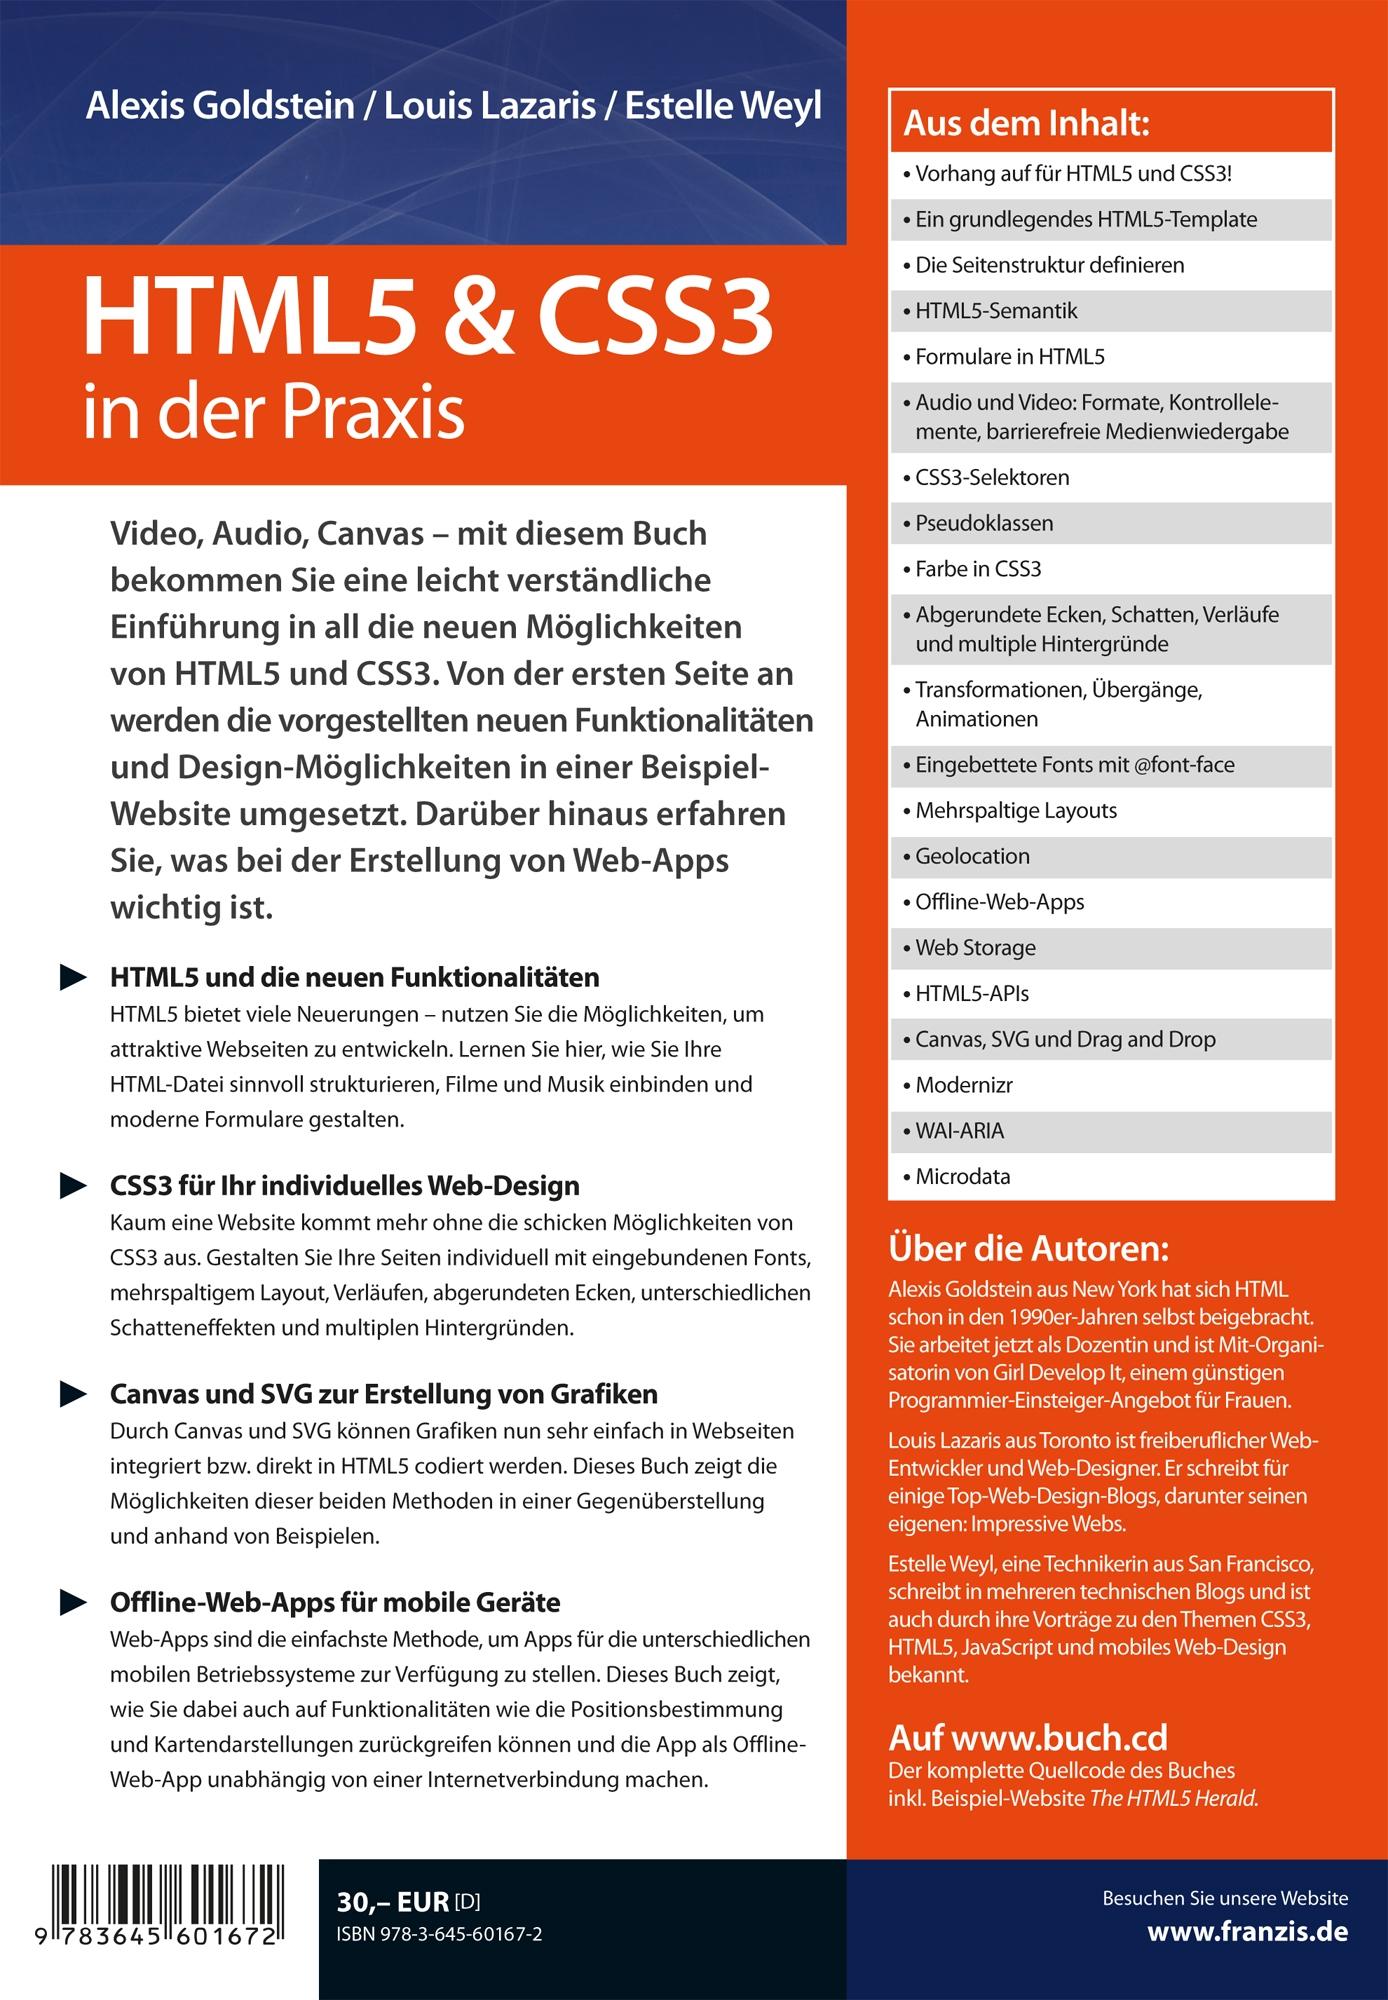 HTML5 & CSS3 in der Praxis: Amazon.de: Alexis Goldstein, Louis ...